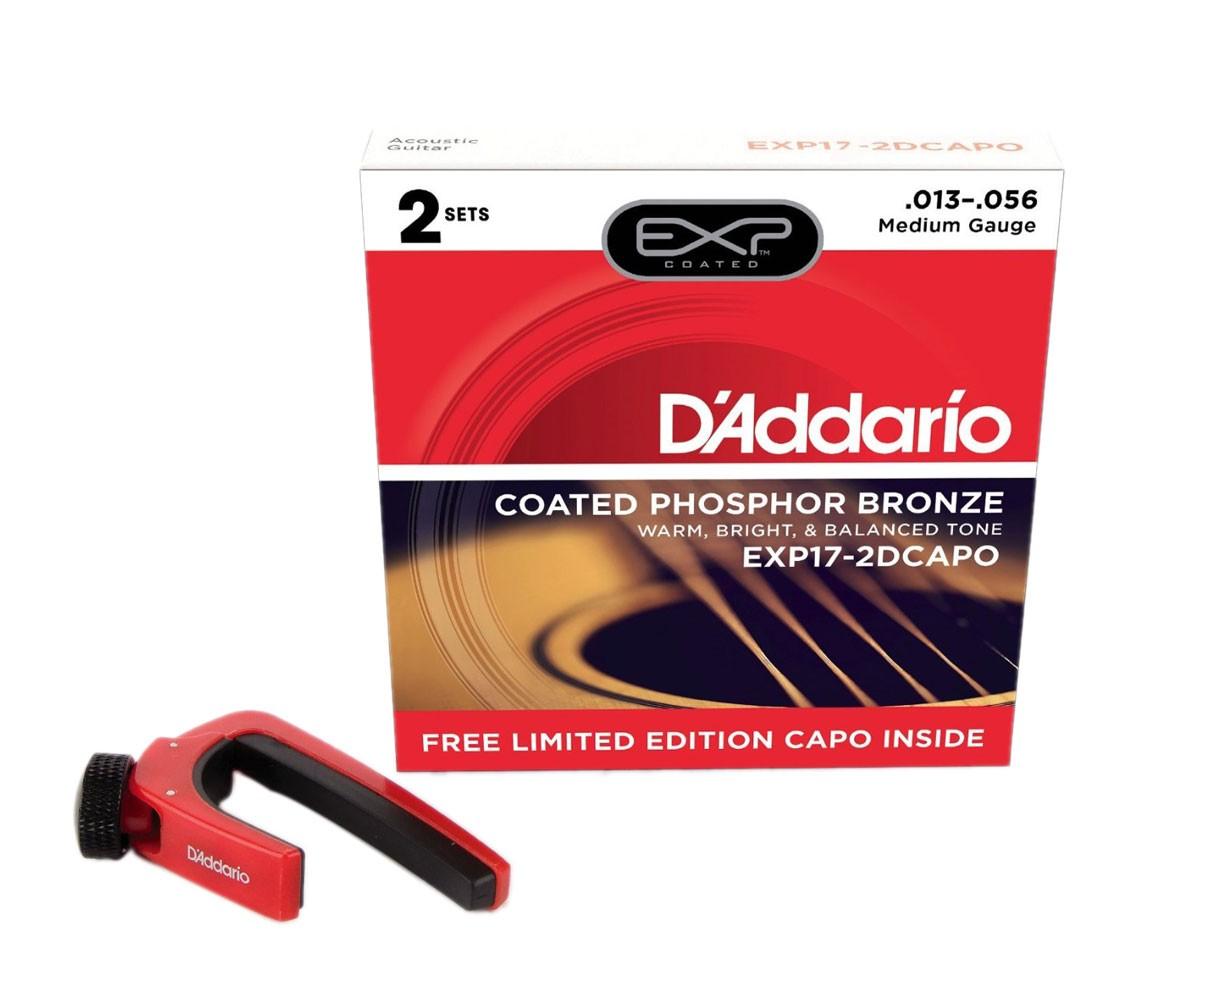 D'Addario EXP17 Coated Phosphor Bronze Medium Acoustic Guitar Strings 2 Sets w/Capo